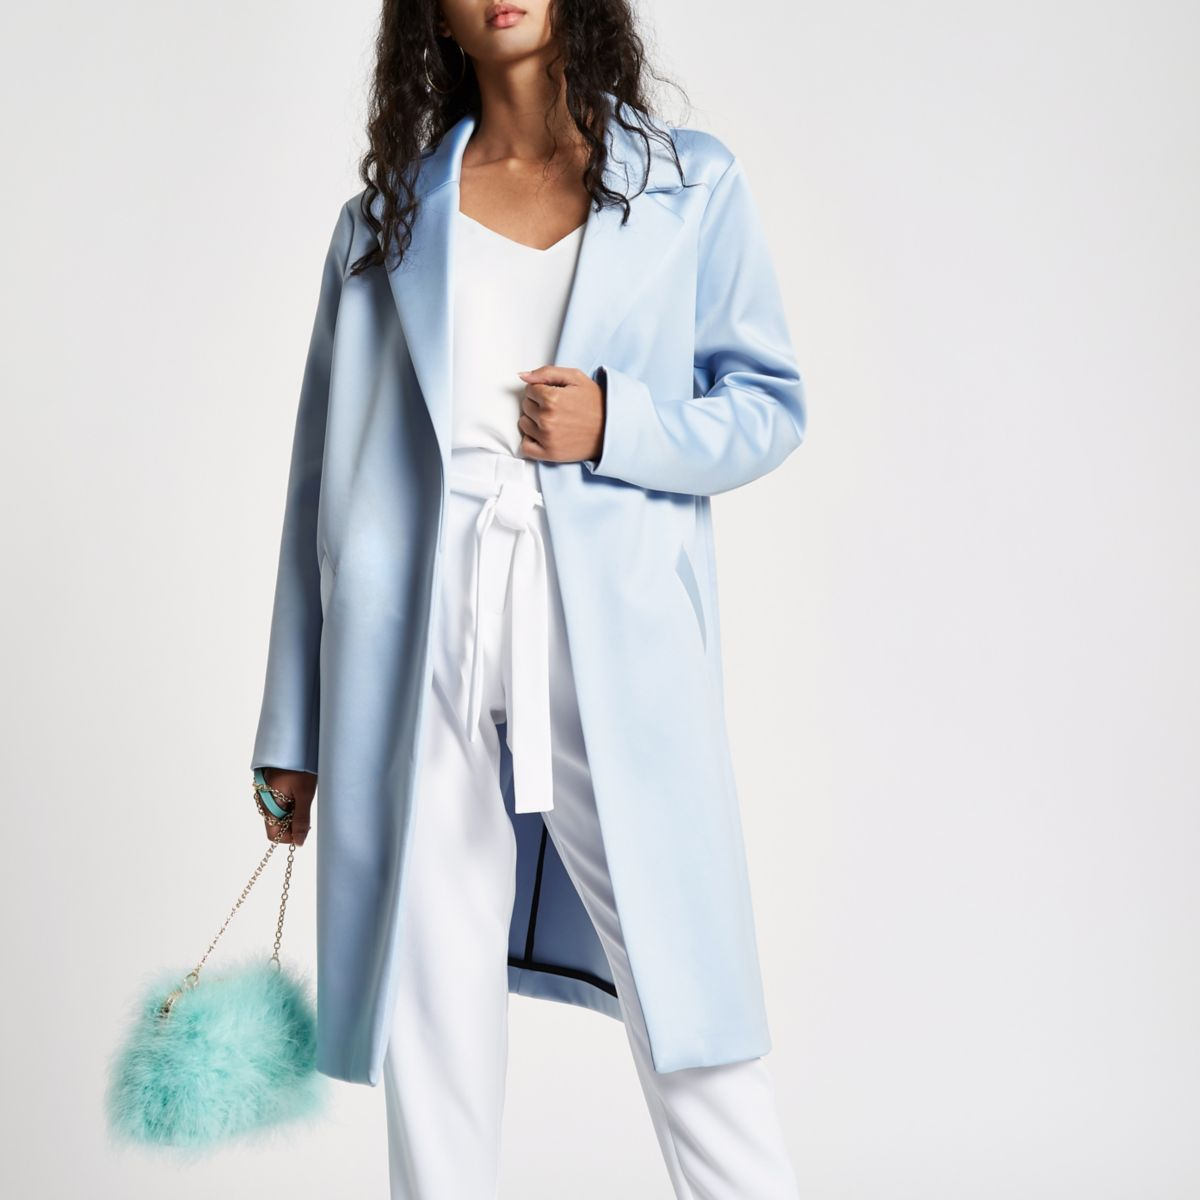 Light blue satin tailored coat